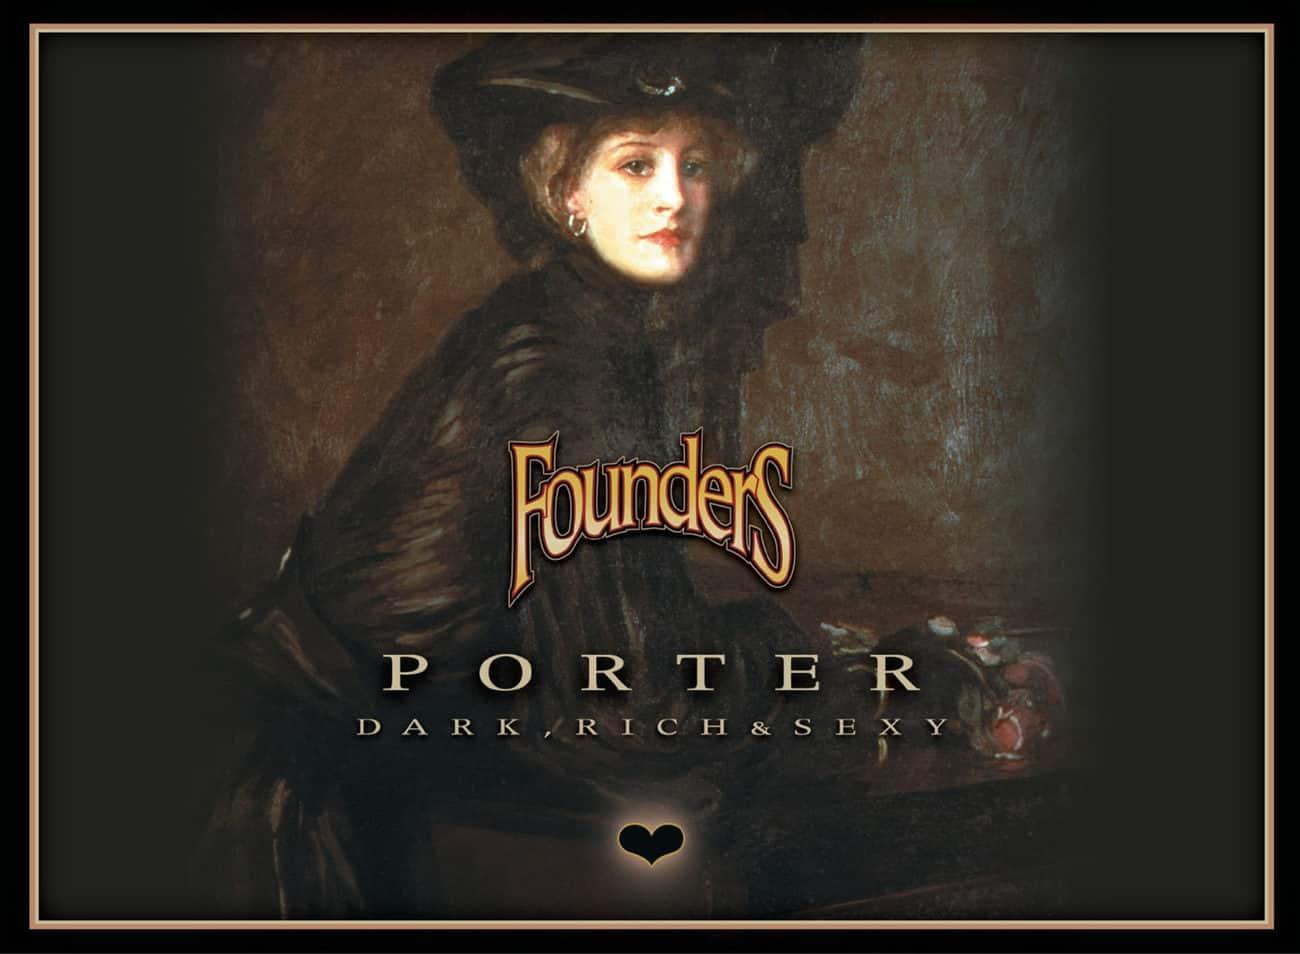 Founders Porter etichetta